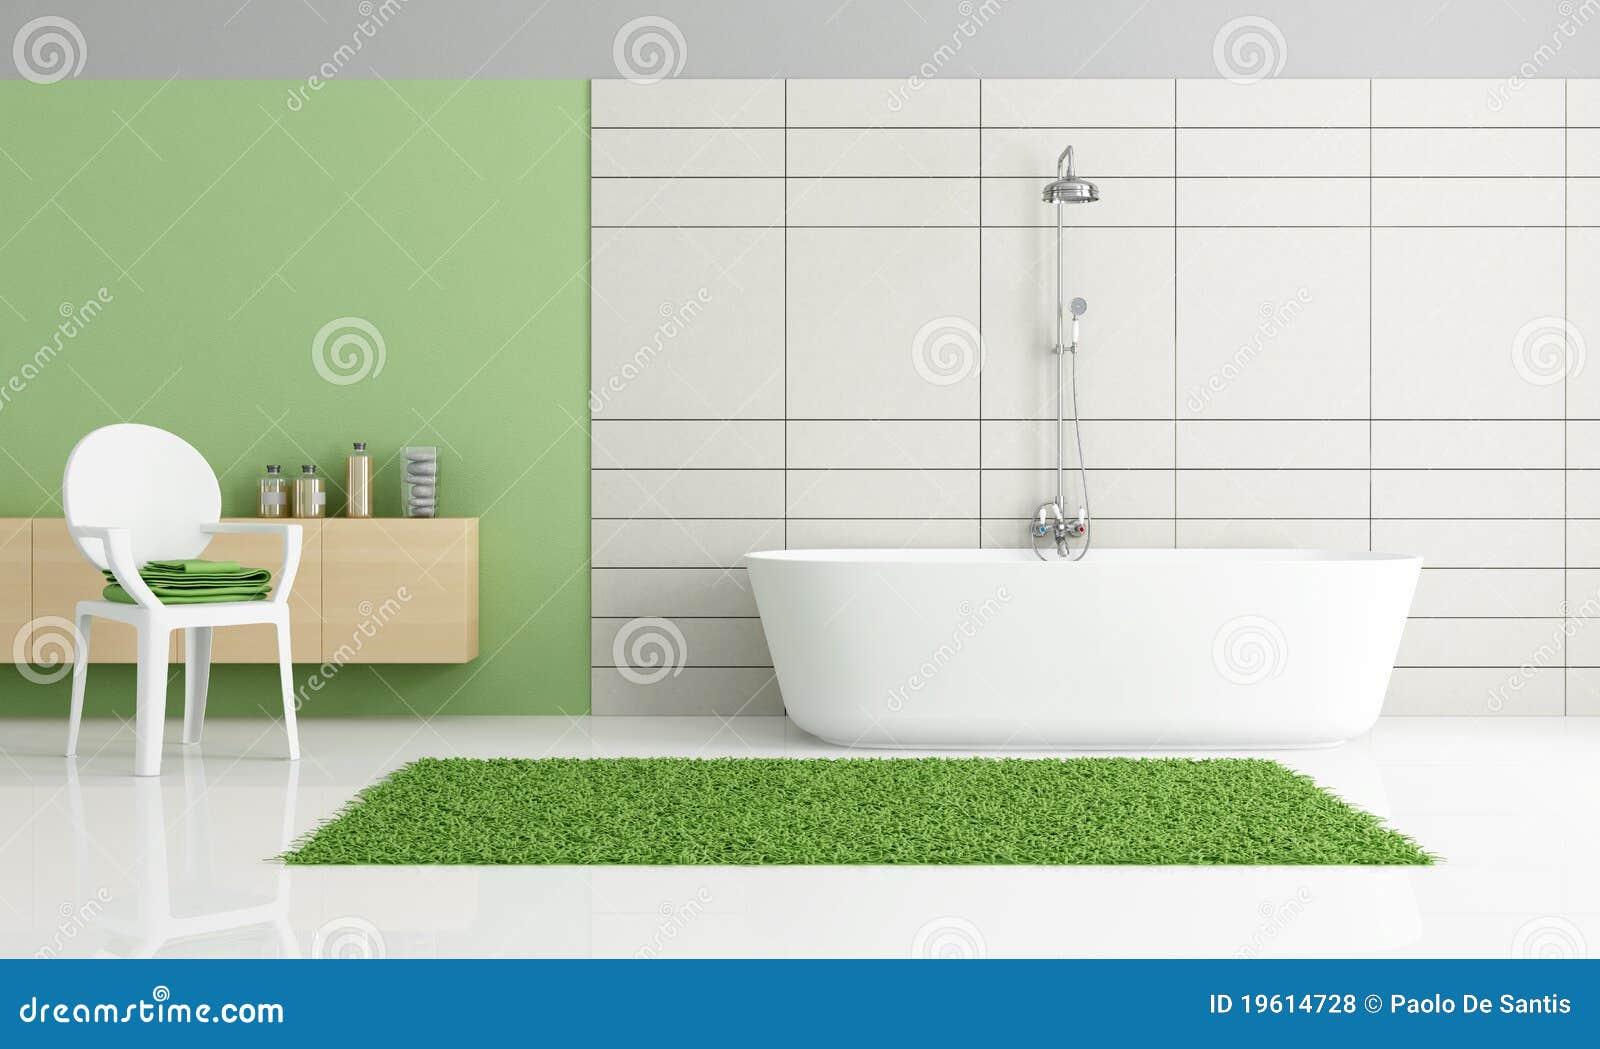 Banheiro Verde E Branco Minimalista Fotos de Stock Royalty Free  #85A823 1300x869 Banheiro Azul E Verde